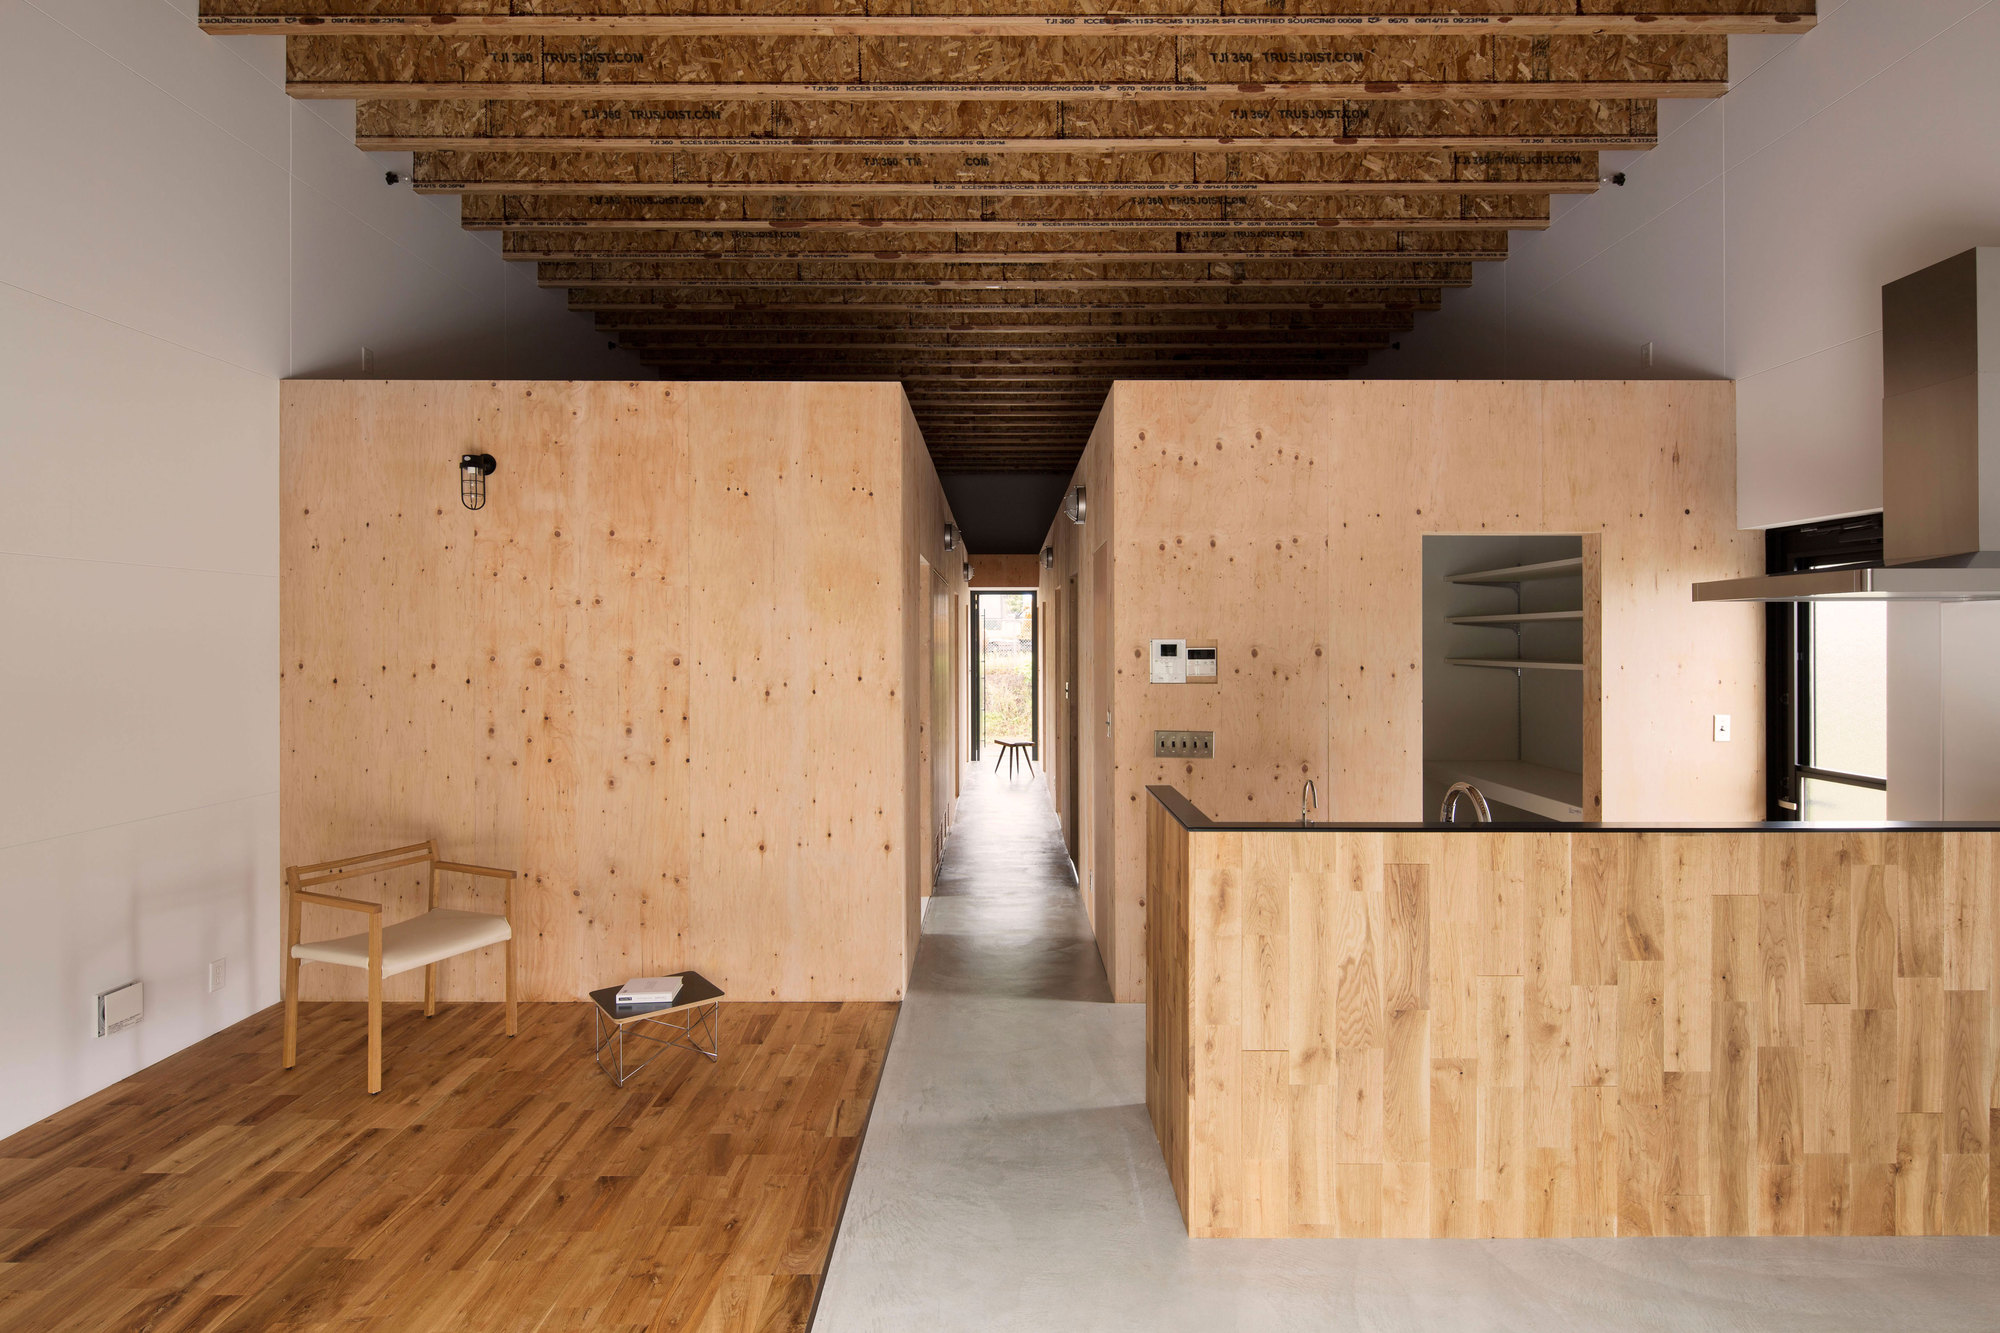 Loft House / CAPD